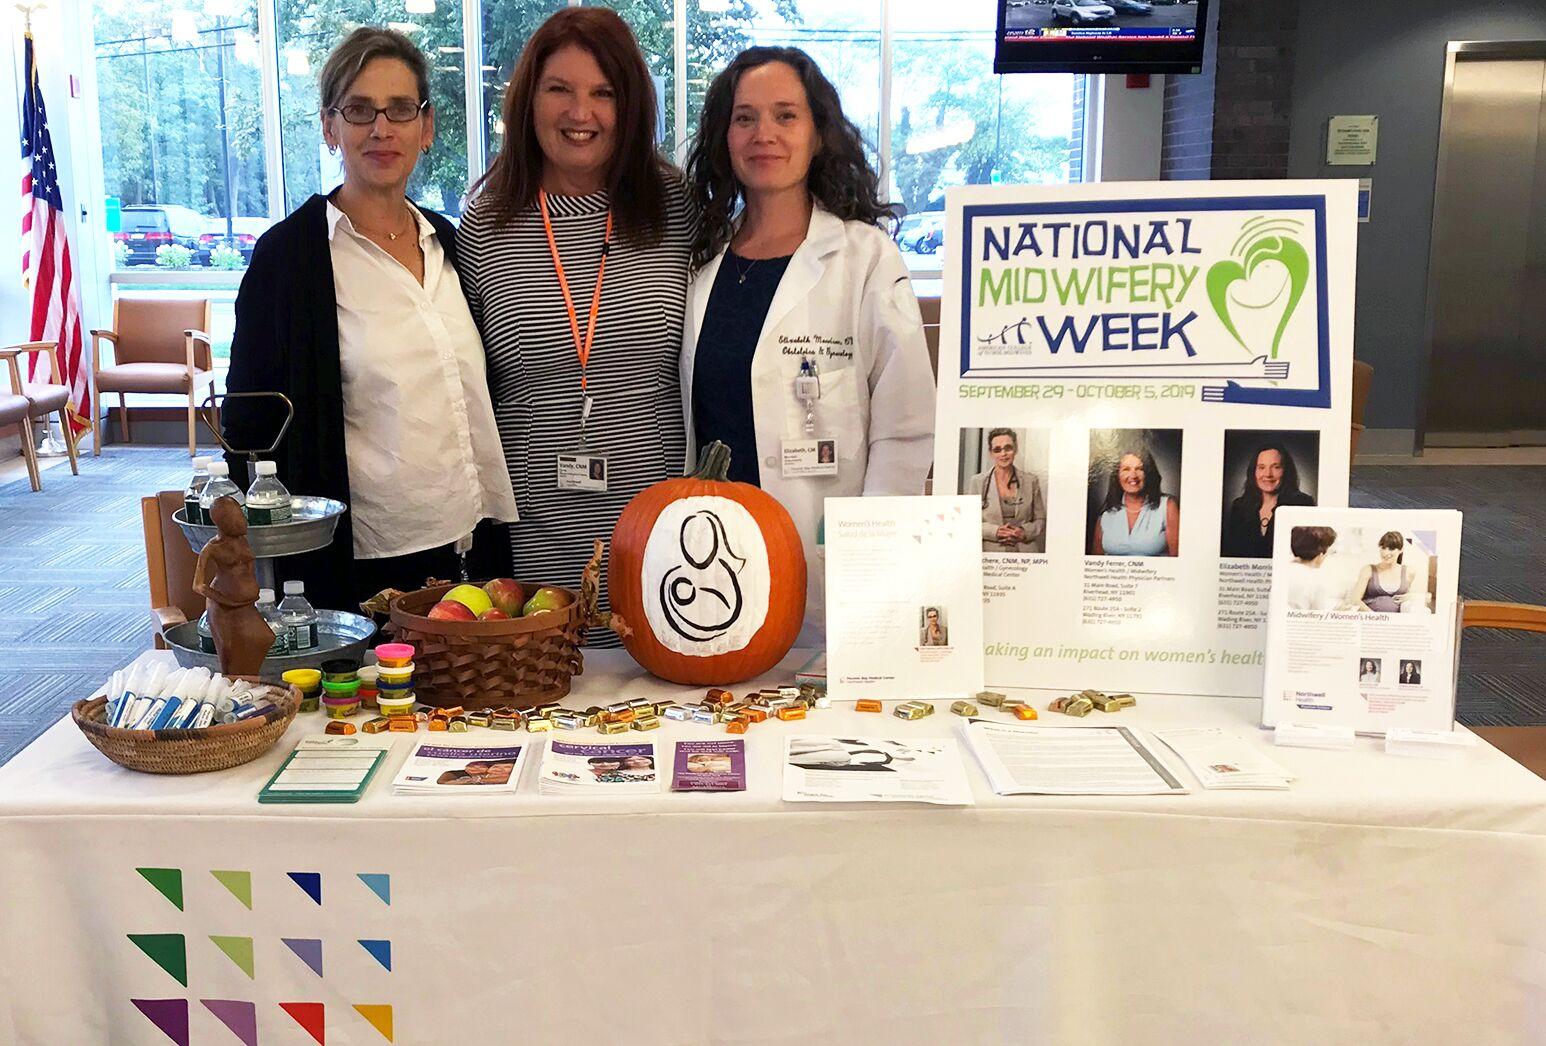 From left: Peconic Bay Medical Center's Julia Chachere, NP; Vandy Ferrer, CNM; and Elizabeth Morrison, CM.